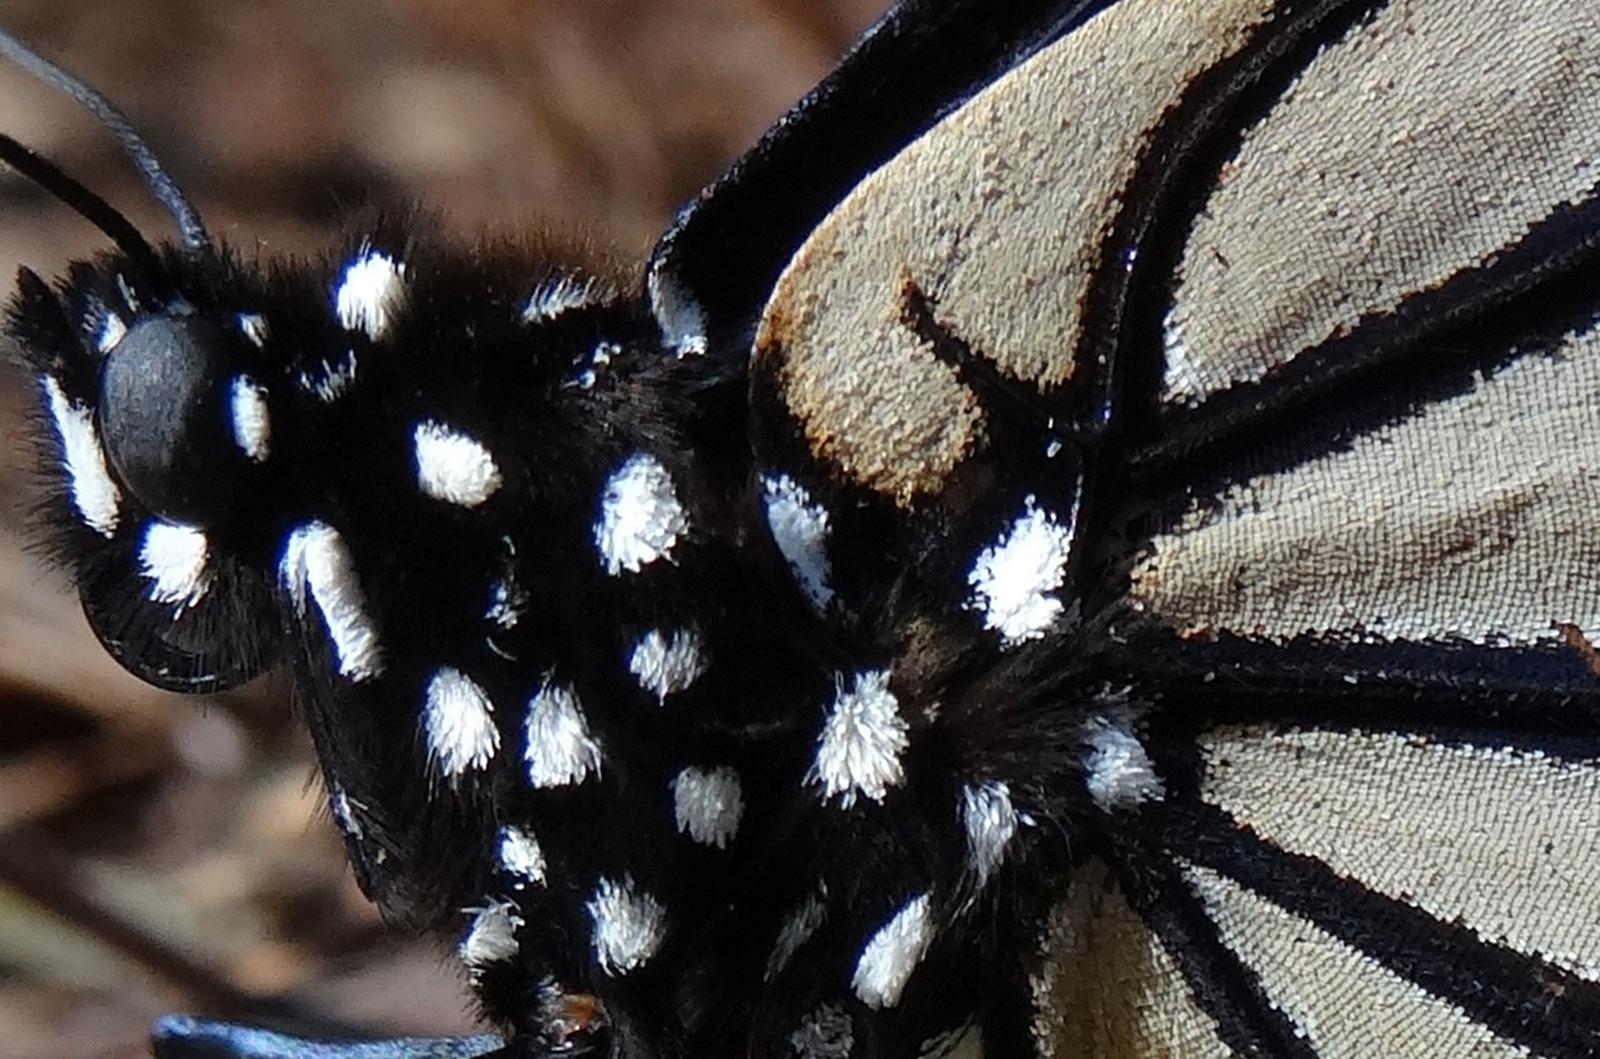 Monarch butterfly body - photo#41